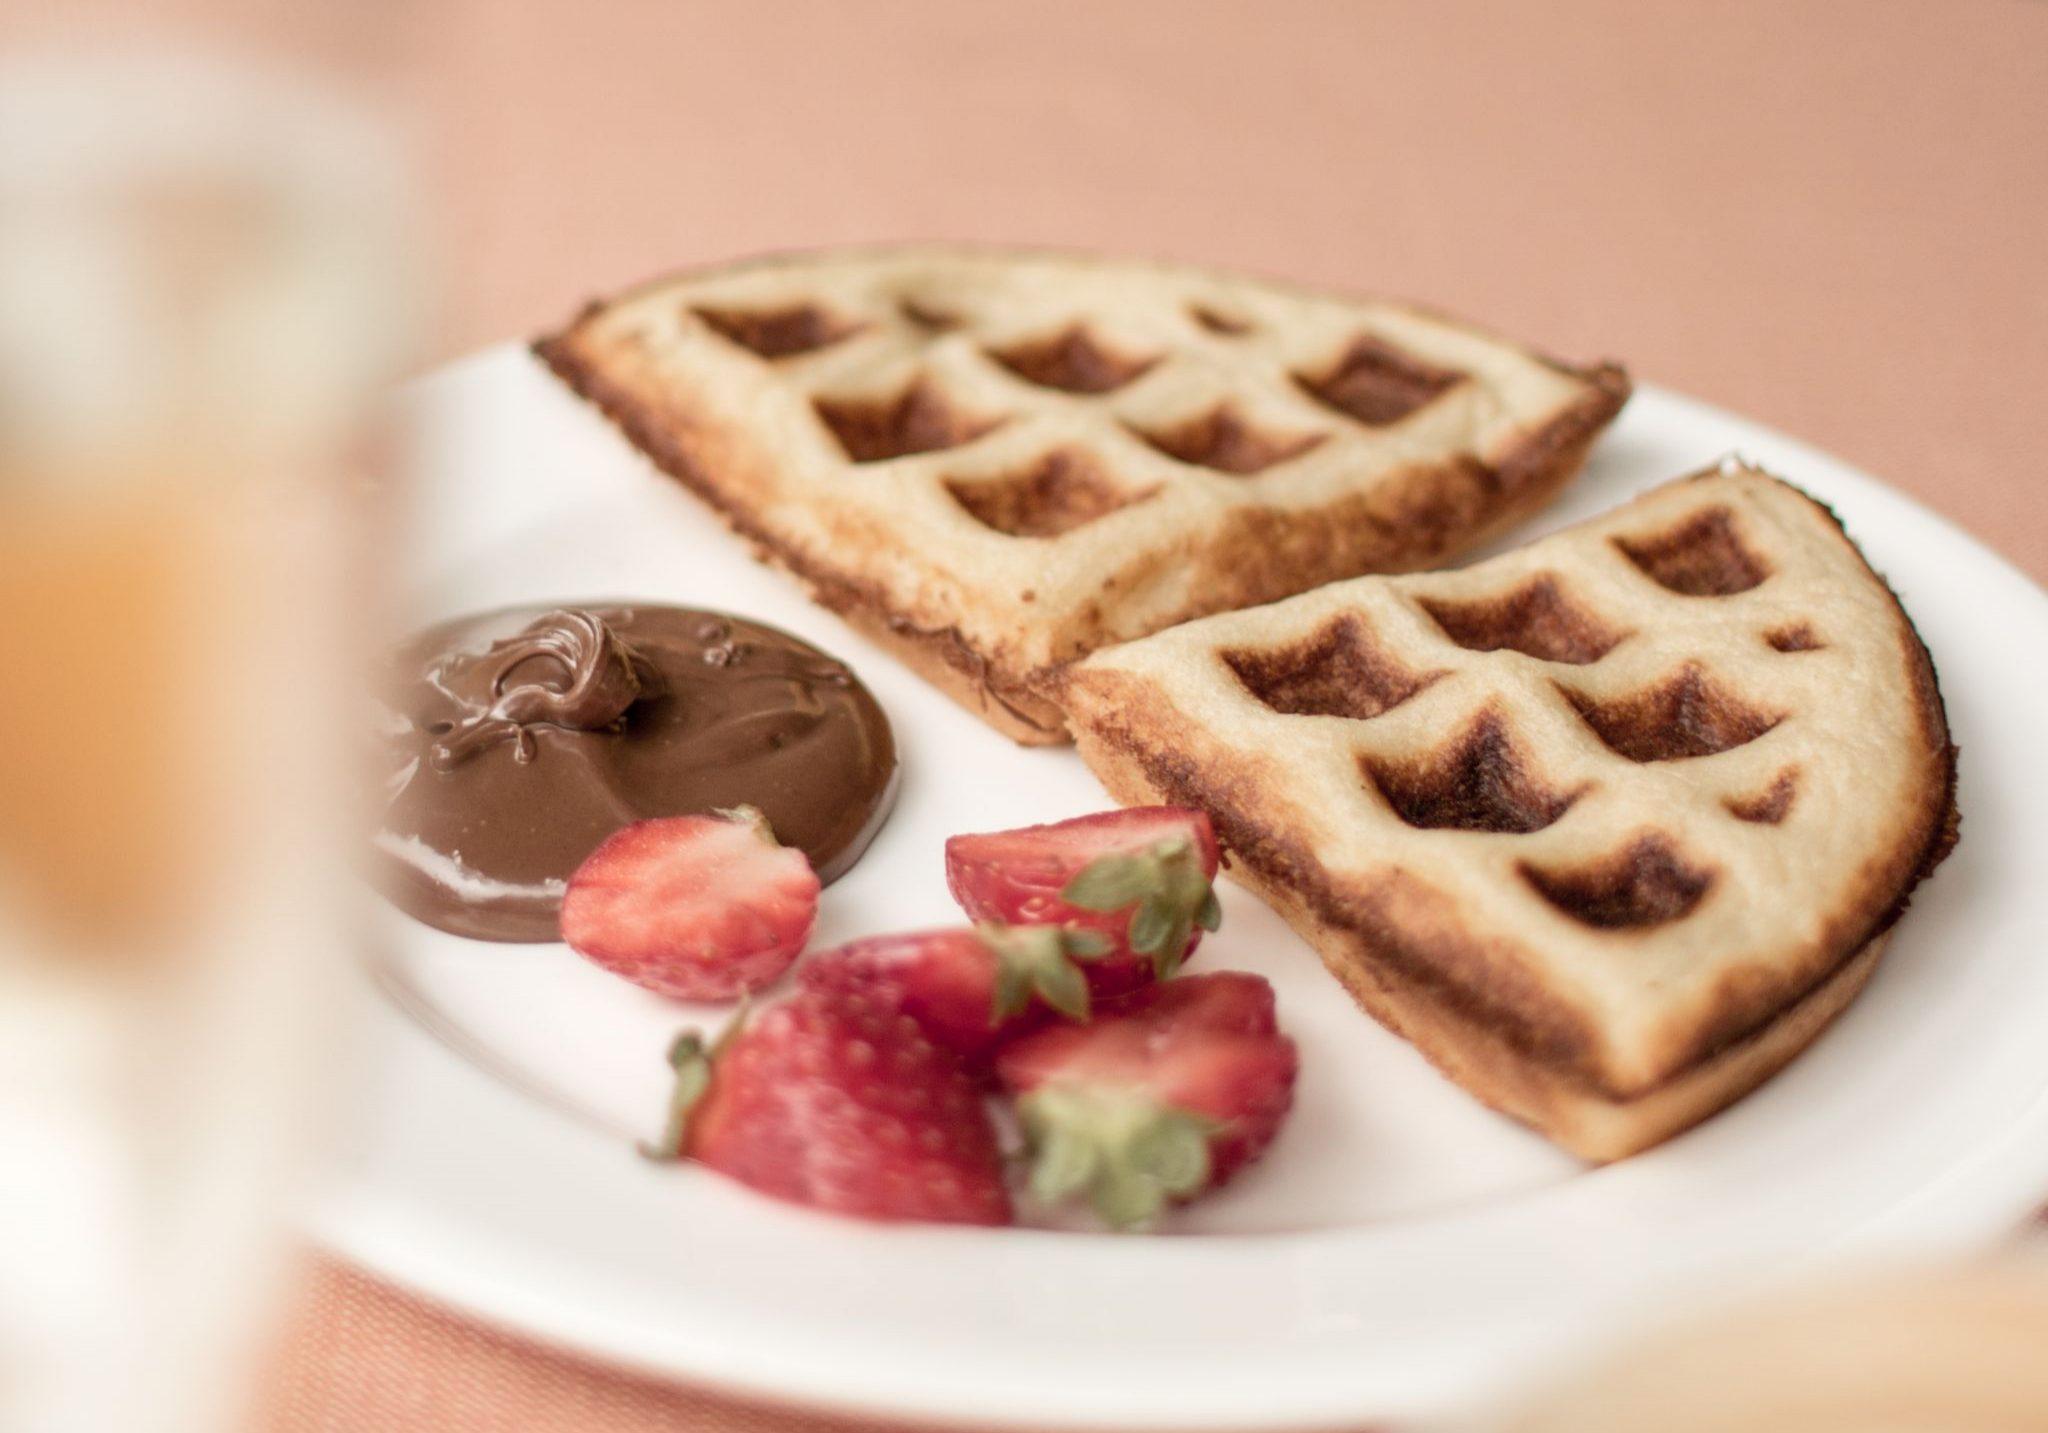 Adler Dolomites Hotel Ortisei Italy Hotel Review Italian Breakfast Nutella Waffles